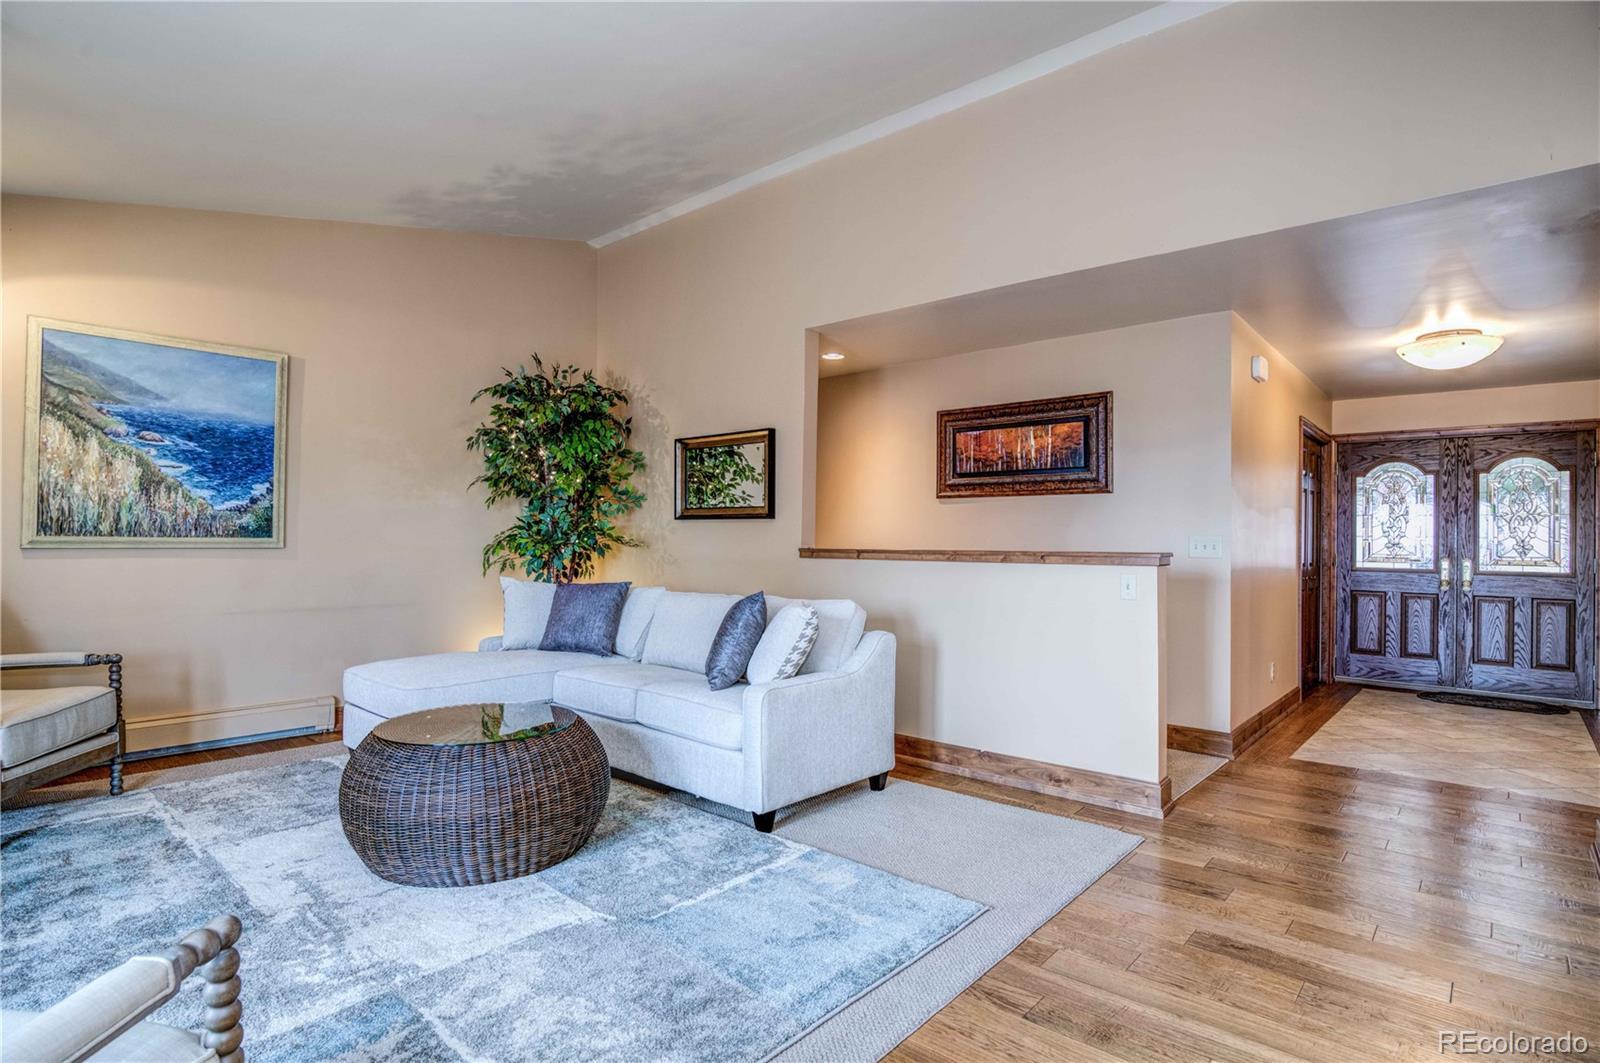 MLS# 5539974 - 6 - 5505 Saddle Rock Place, Colorado Springs, CO 80918